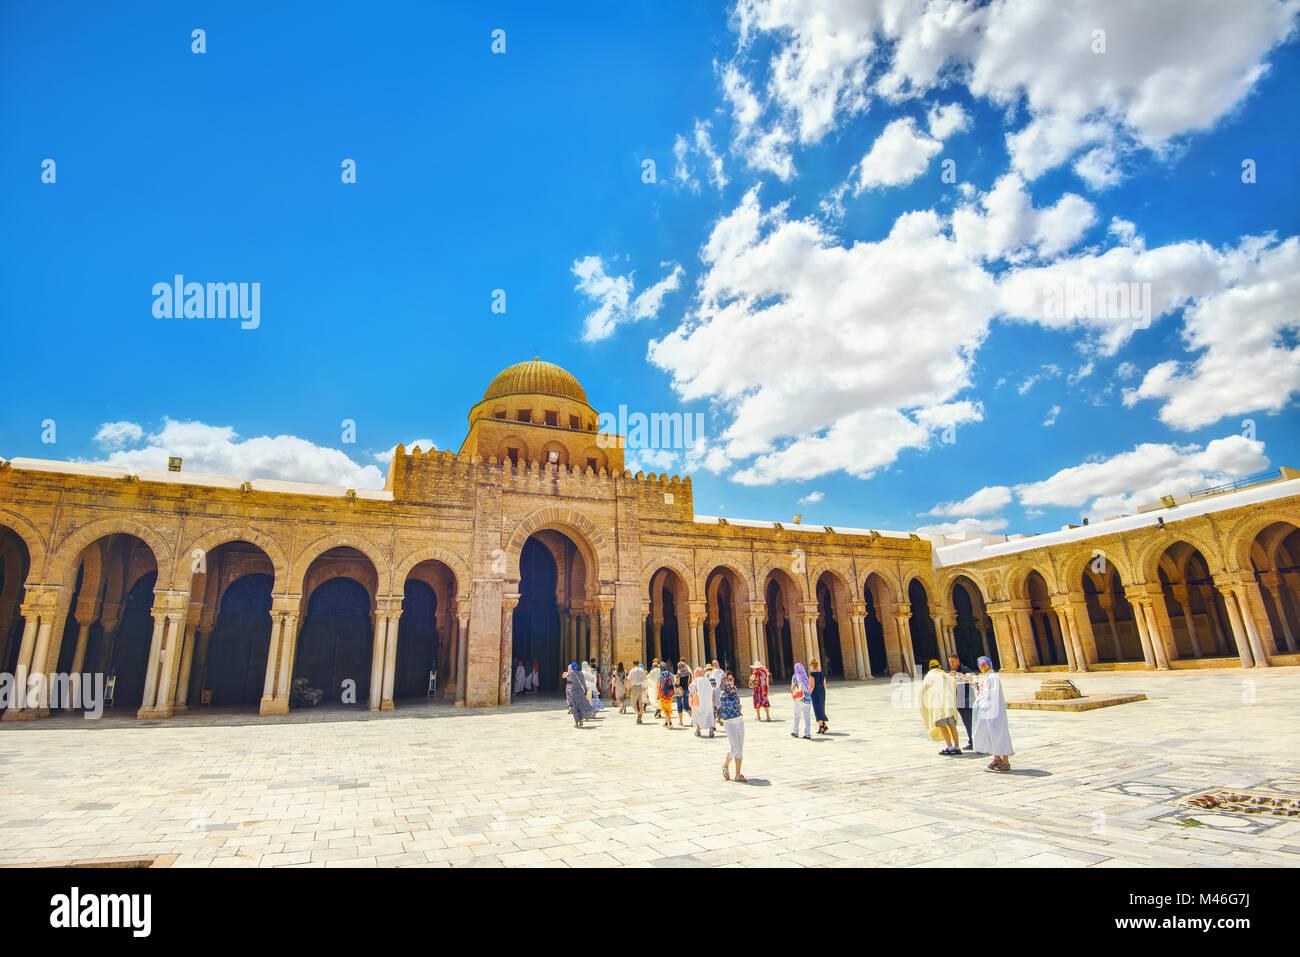 Tourist group sightseeing the Great Mosque (Sidi Oqba) of Kairouan, Islam's sacred city. Kairouan, Tunisia, - Stock Image